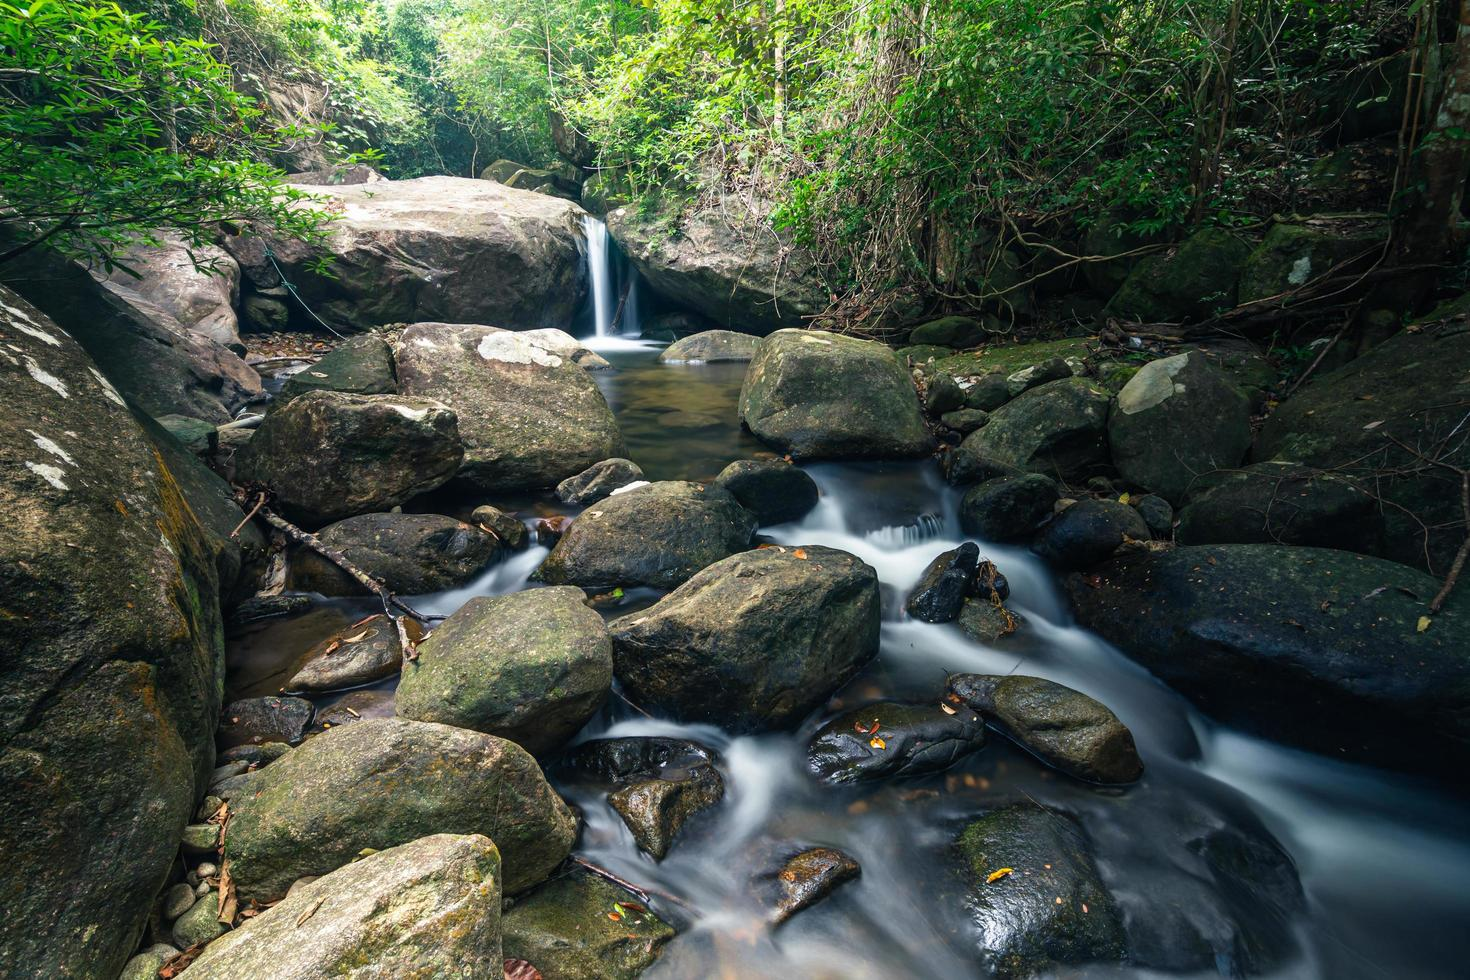 Cascades de Khlong Pla Kang en Thaïlande photo